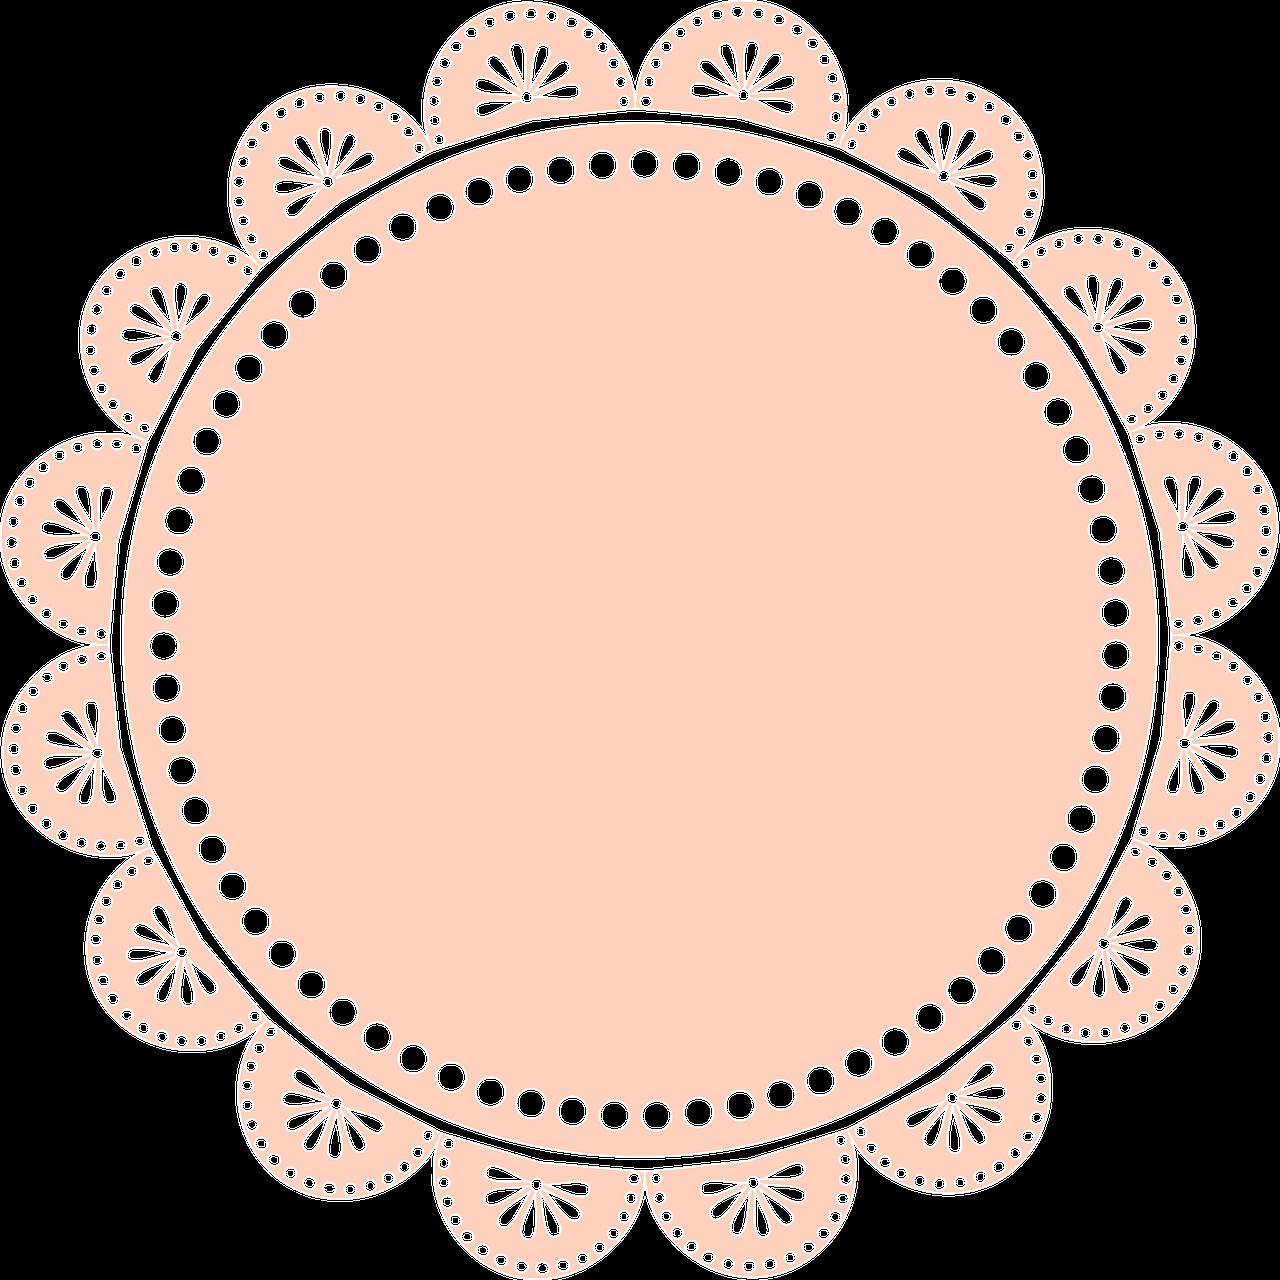 Free Image On Pixabay Digiscrap Lace Circle Frame Flower Frame Circle Frames Frame Logo